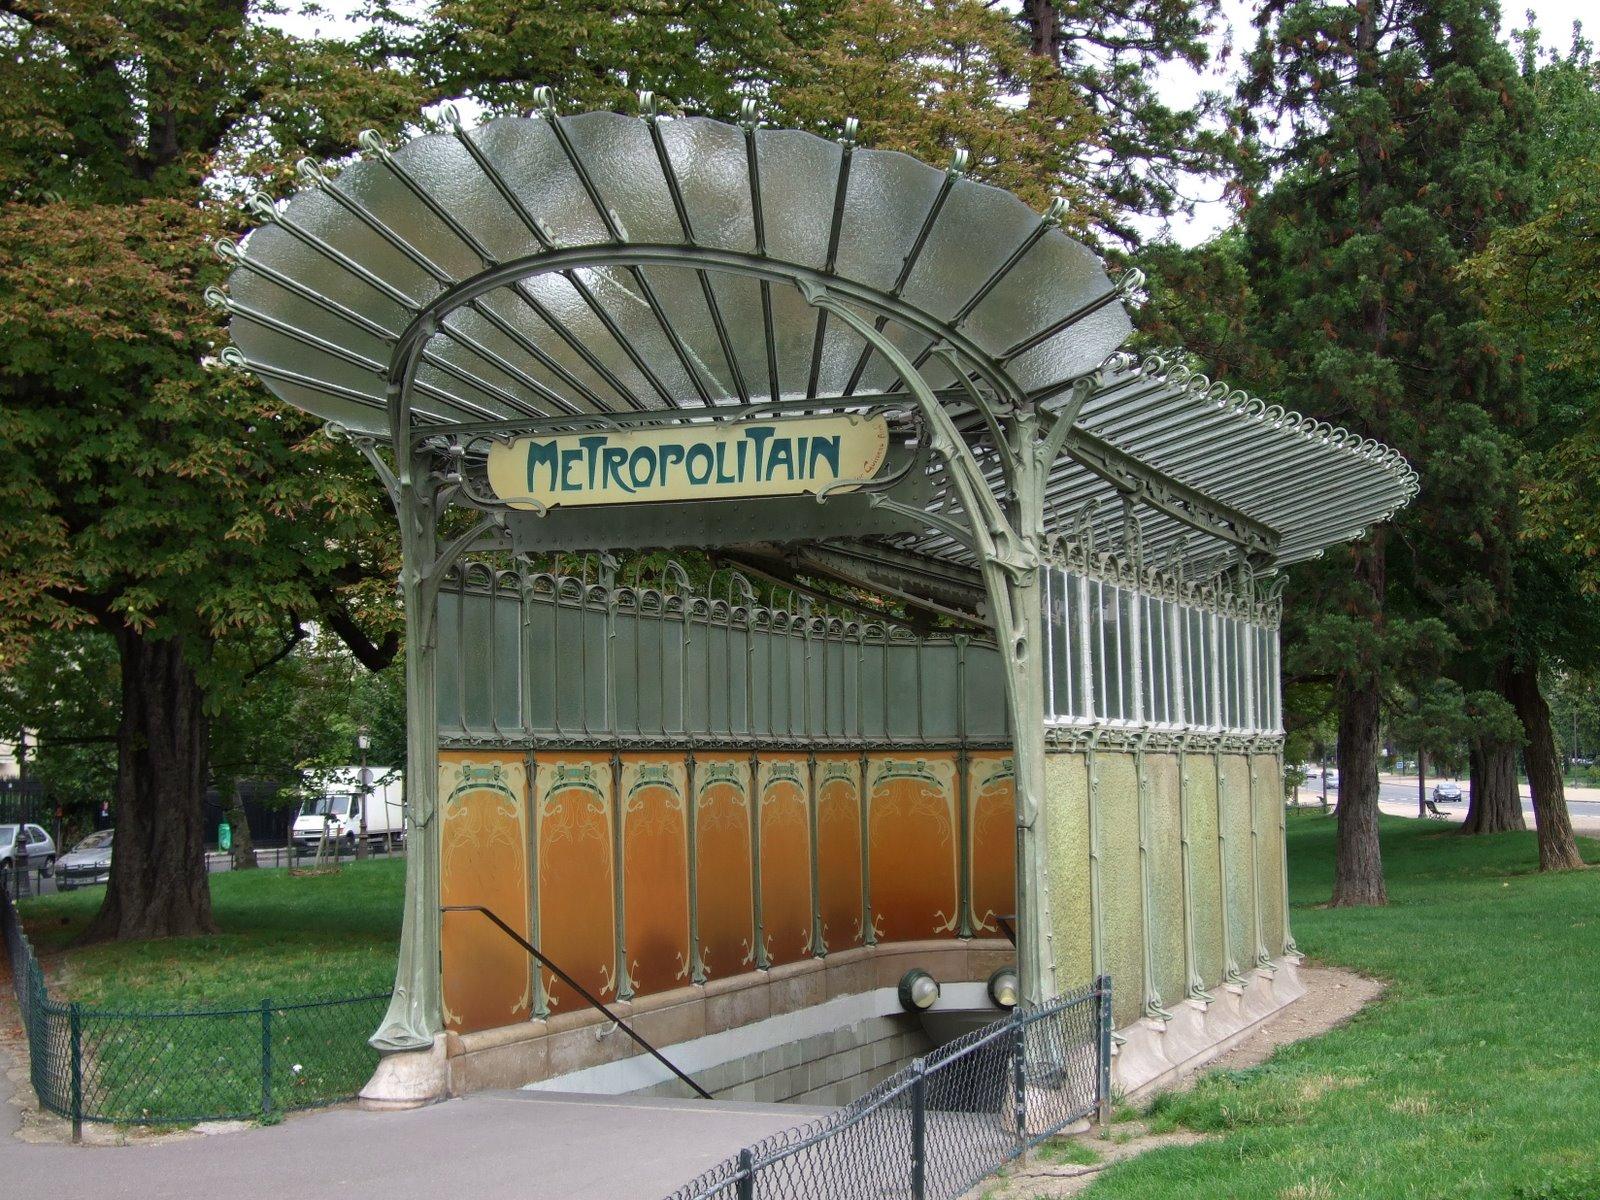 Porte Dauphine Art Nouveau Metro Ingang Door Arthur